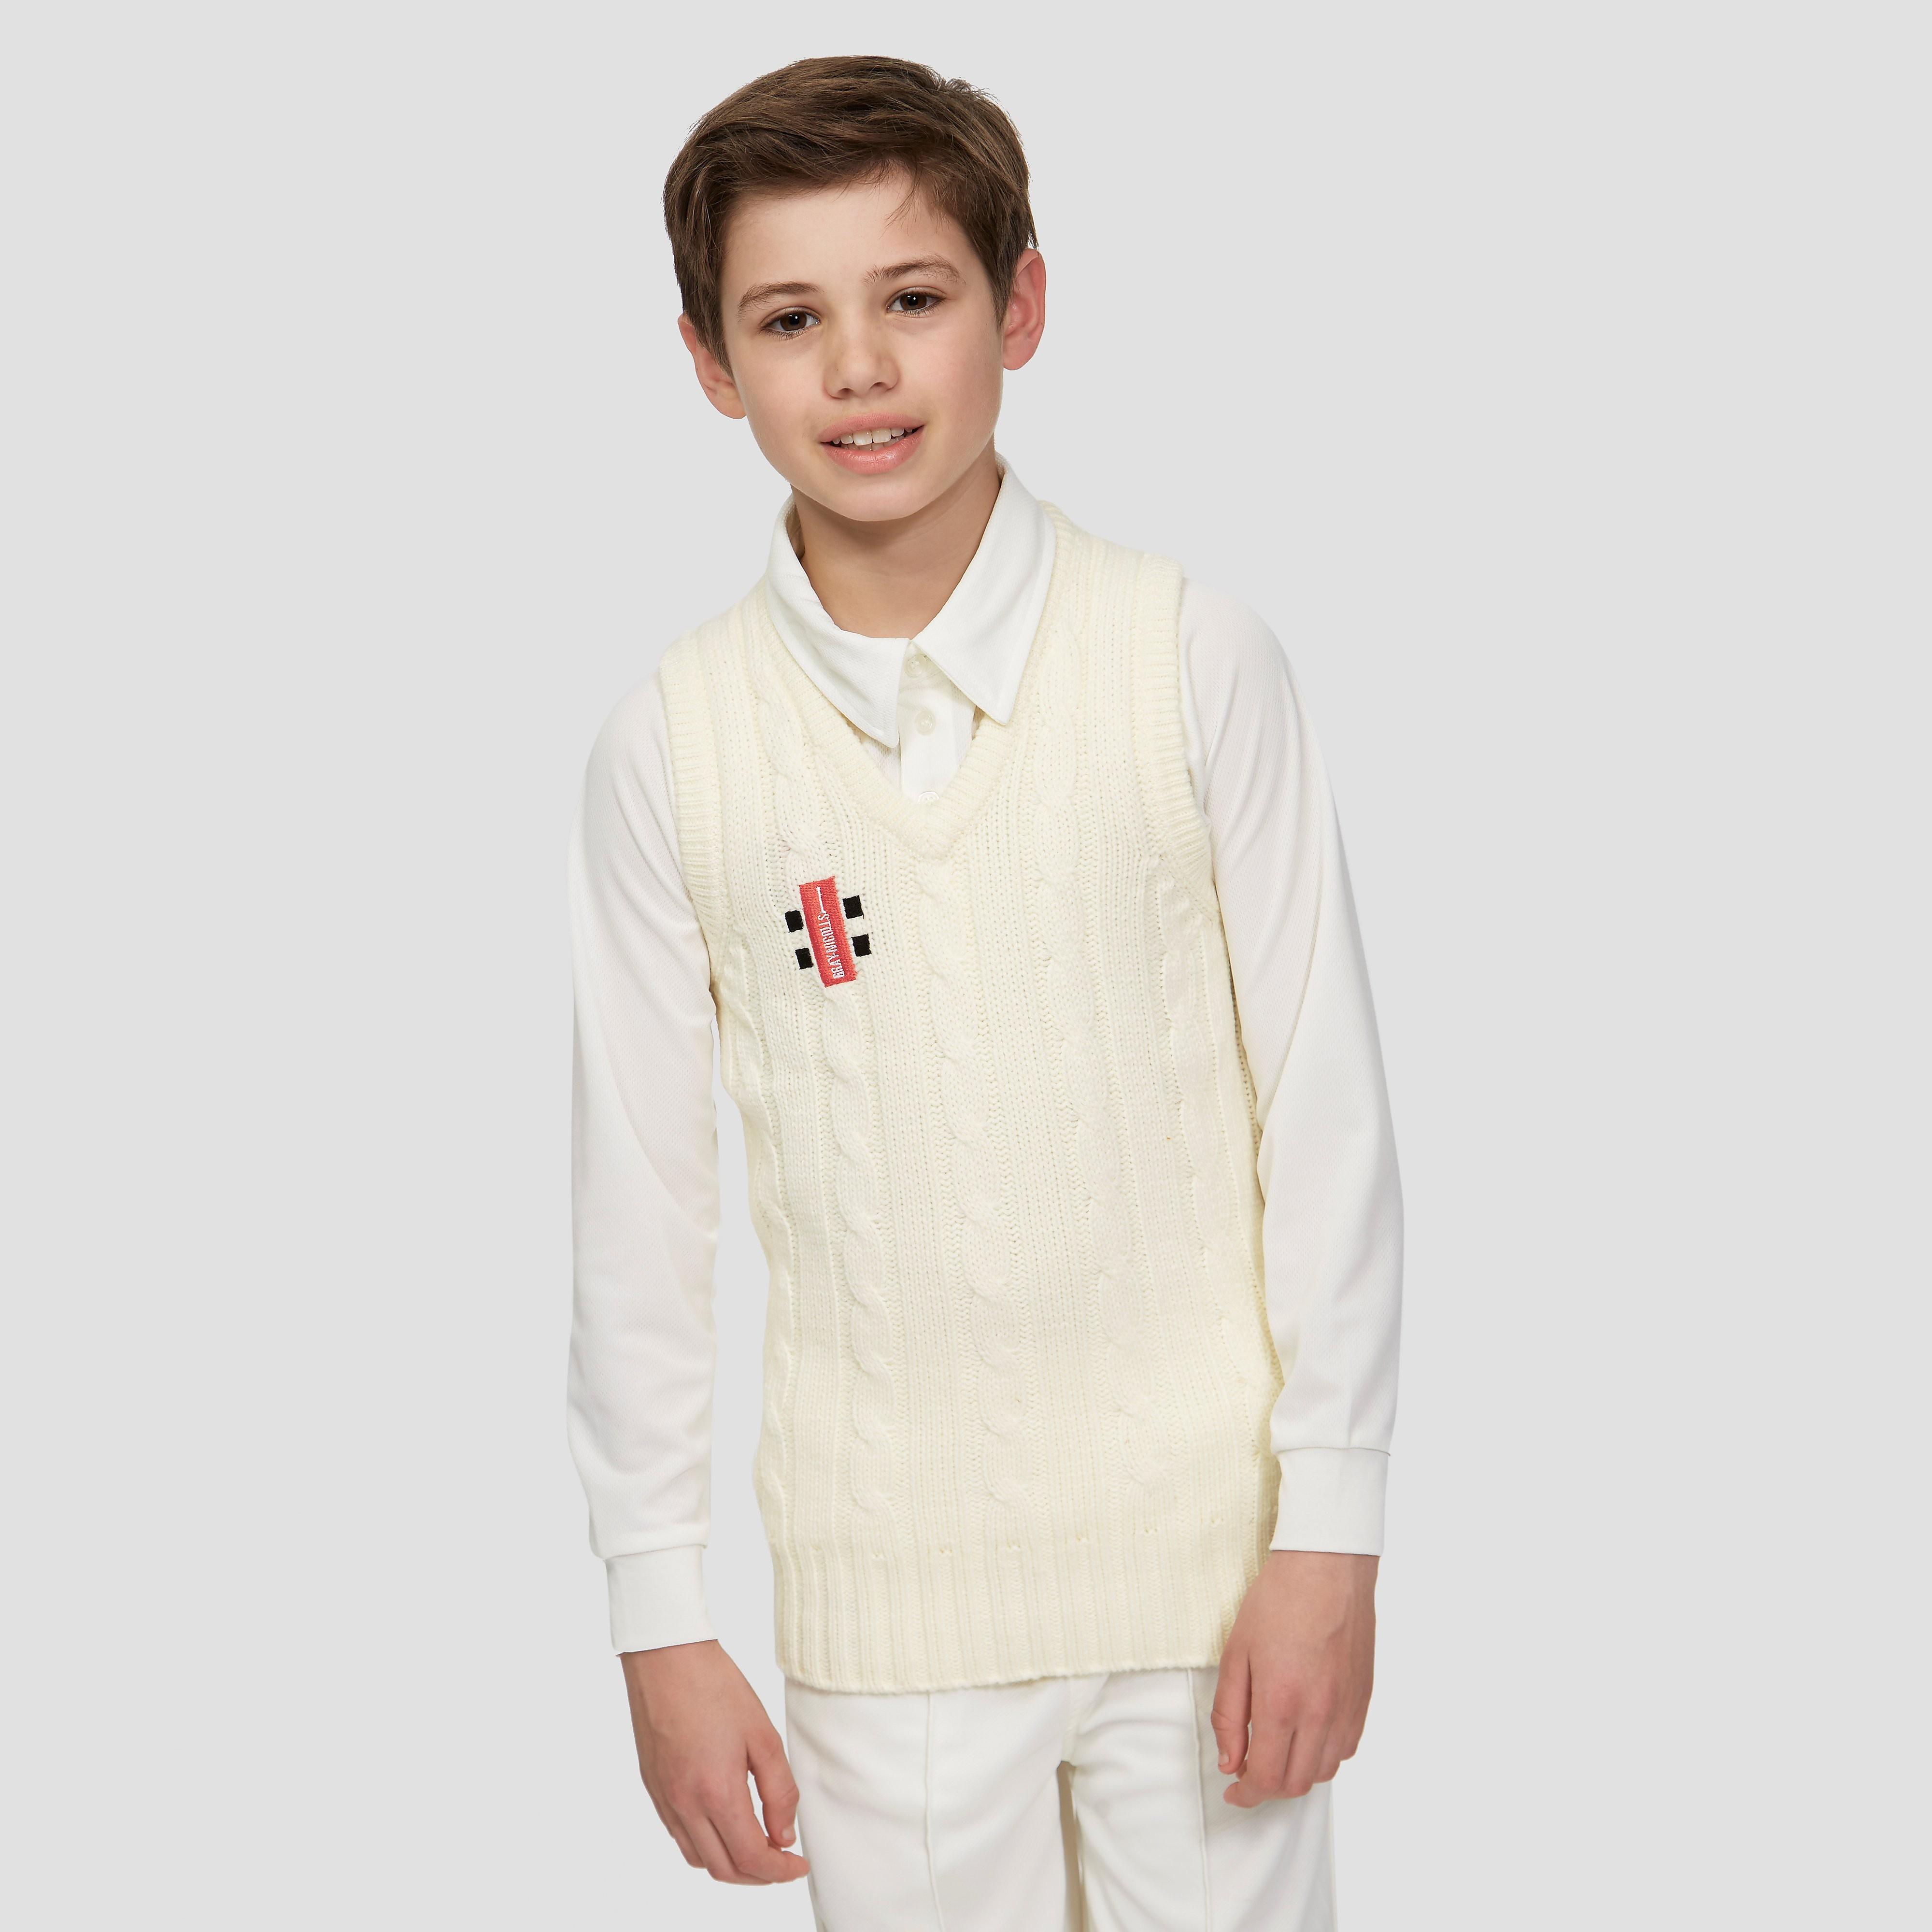 Gray-Nicolls Knitted Acrylic Junior Sleeveless Cricket Jumper